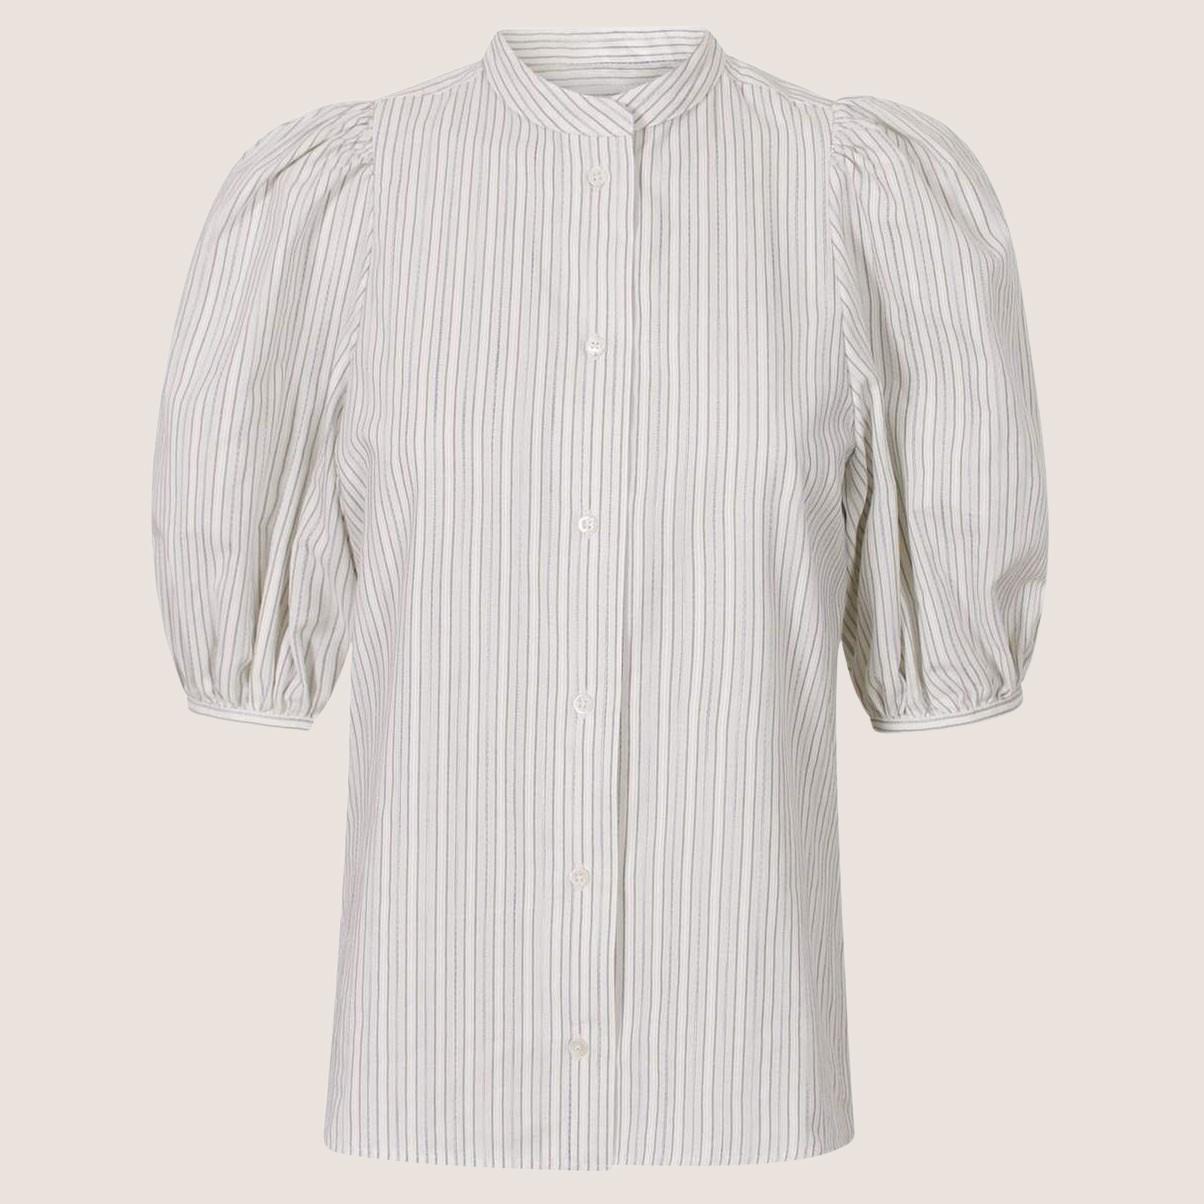 Dalia Shirt